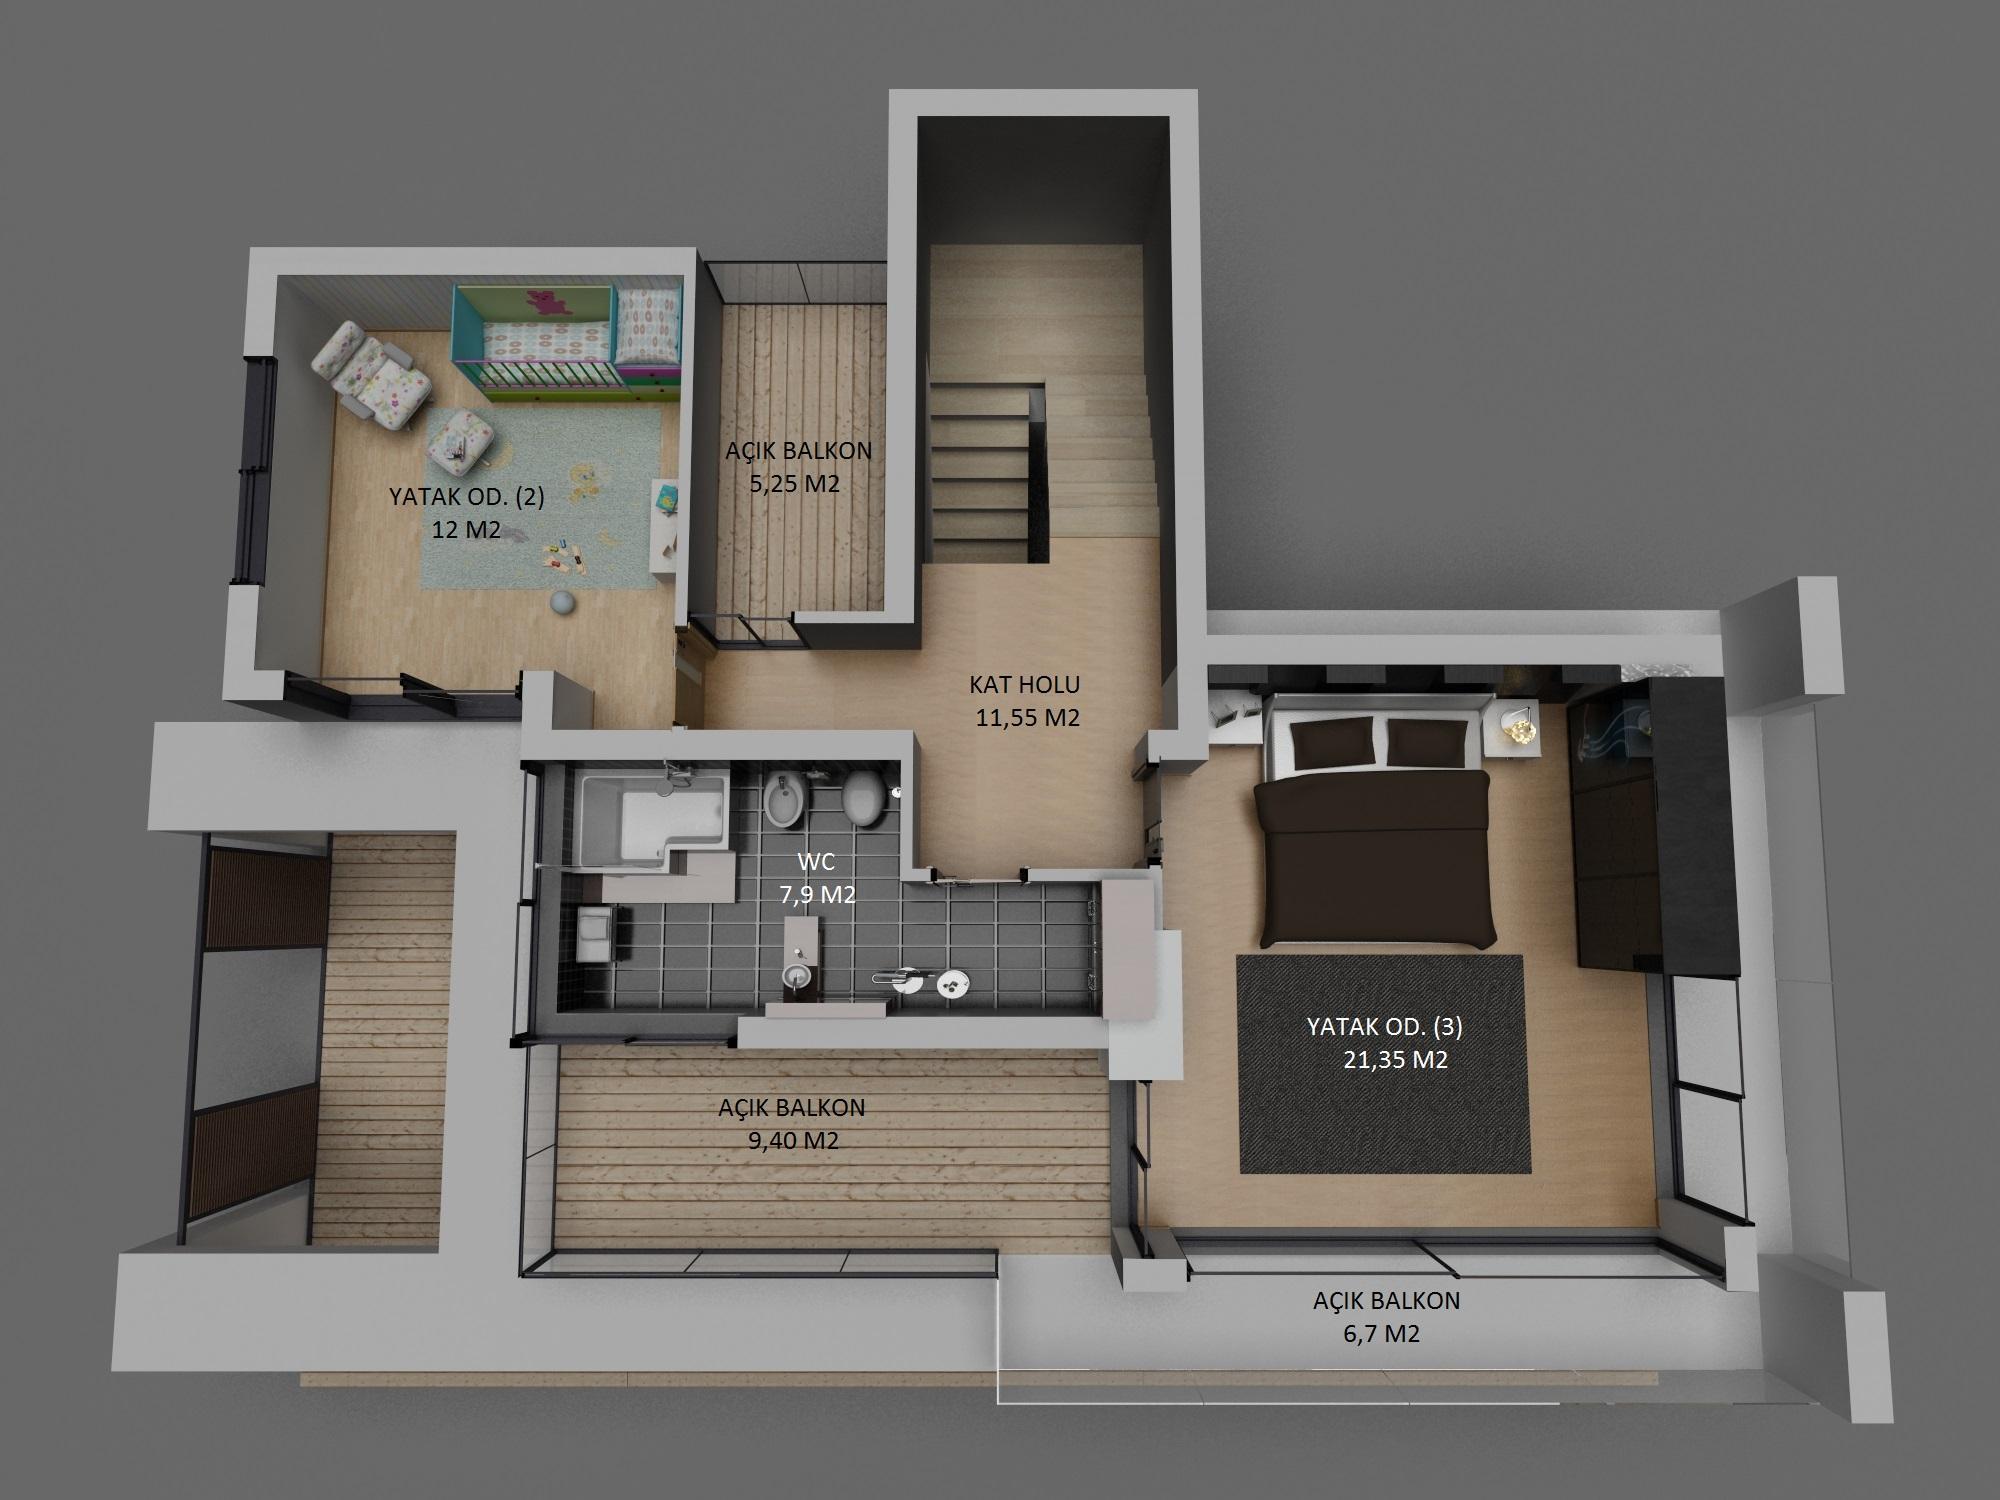 Catalkoy Modern Villa Floor Plan 1 Top Result 50 New 7 Bedroom House Plans Gallery 2017 Hgd6